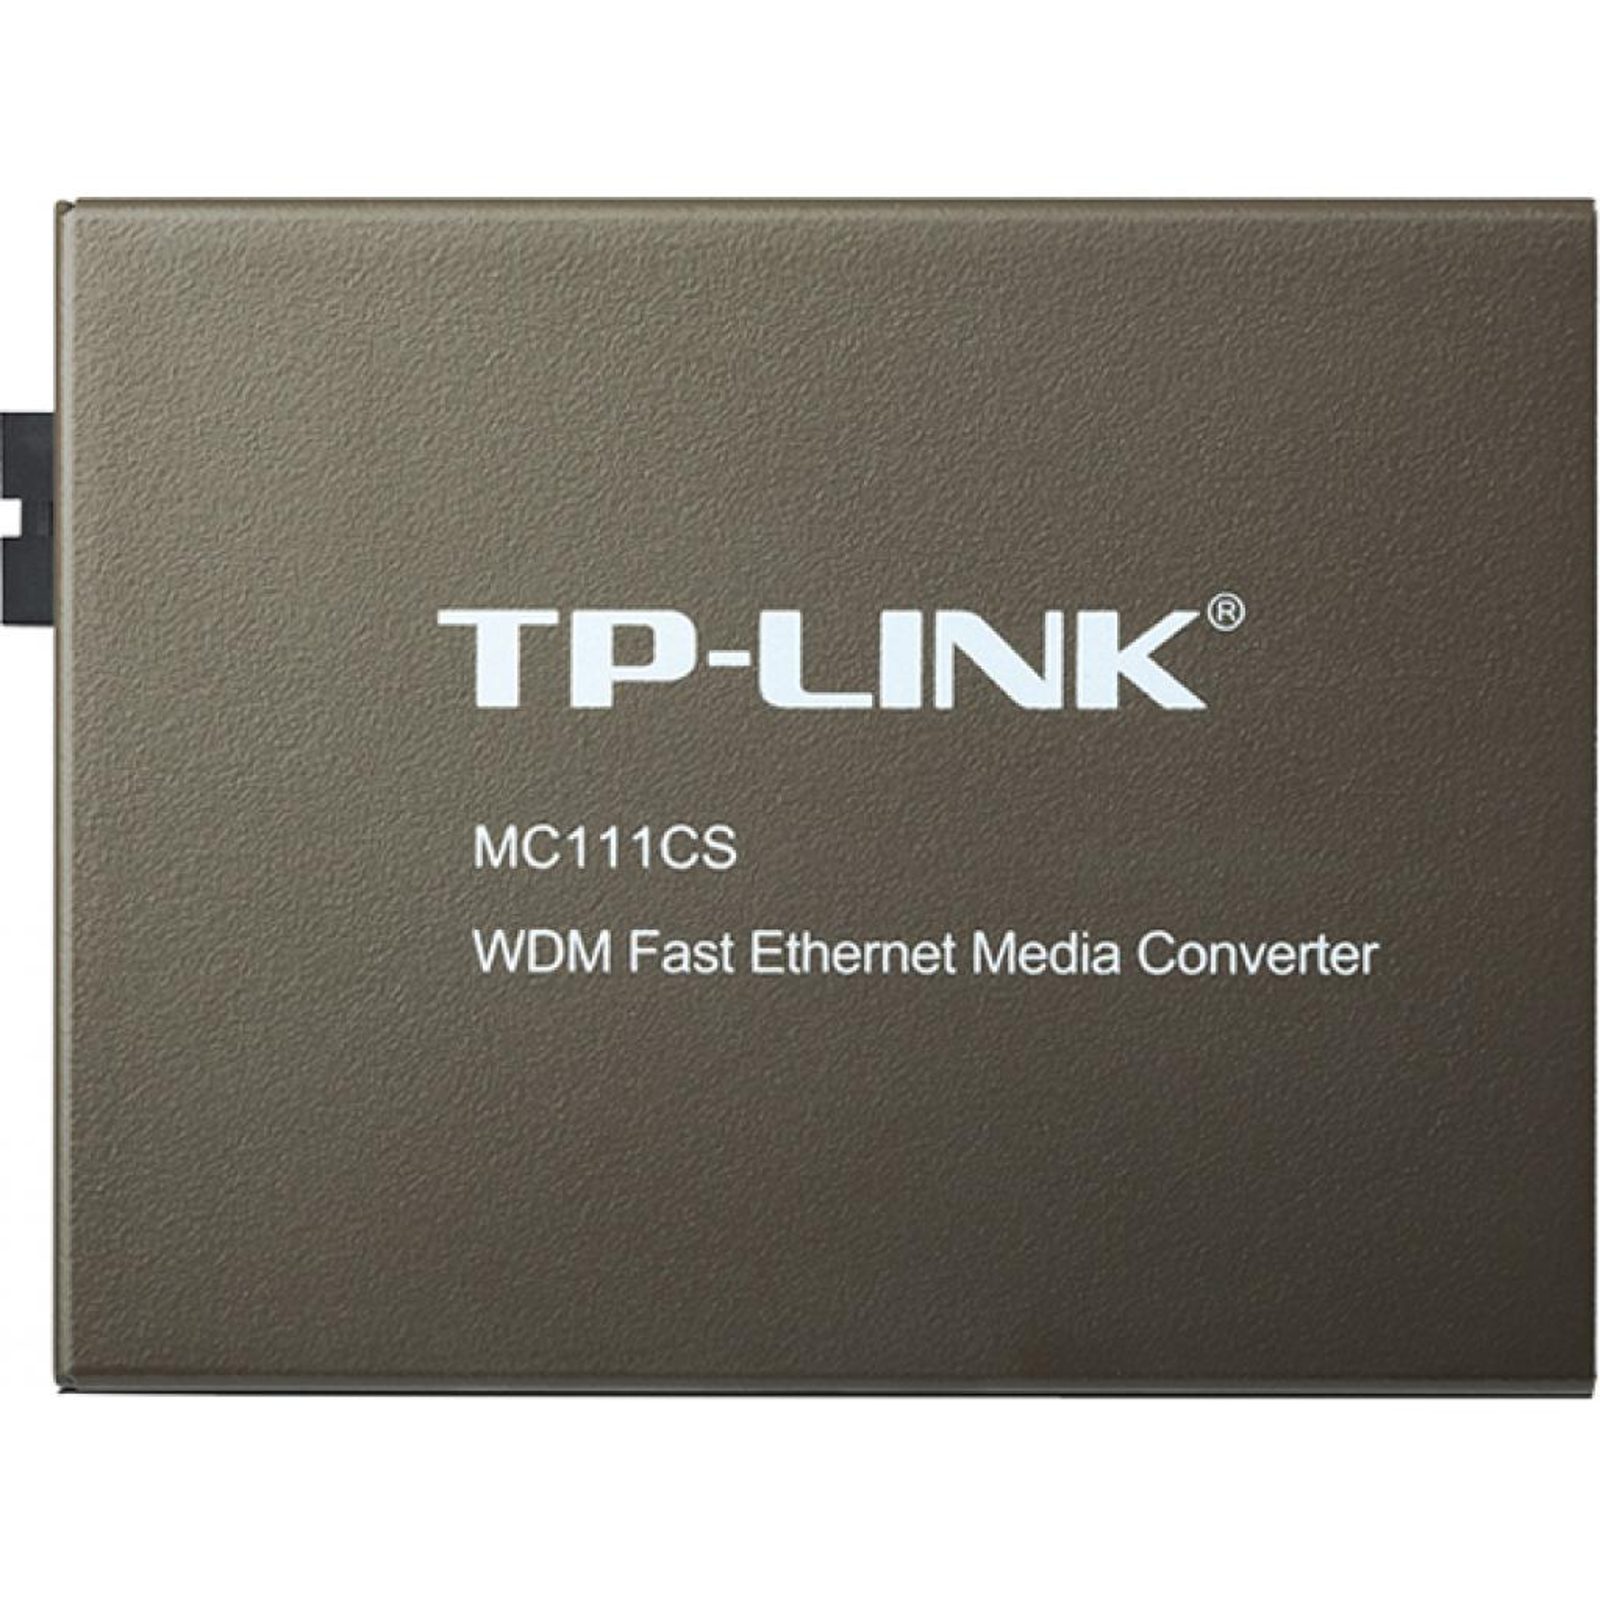 Медиаконвертор TP-Link MC111CS